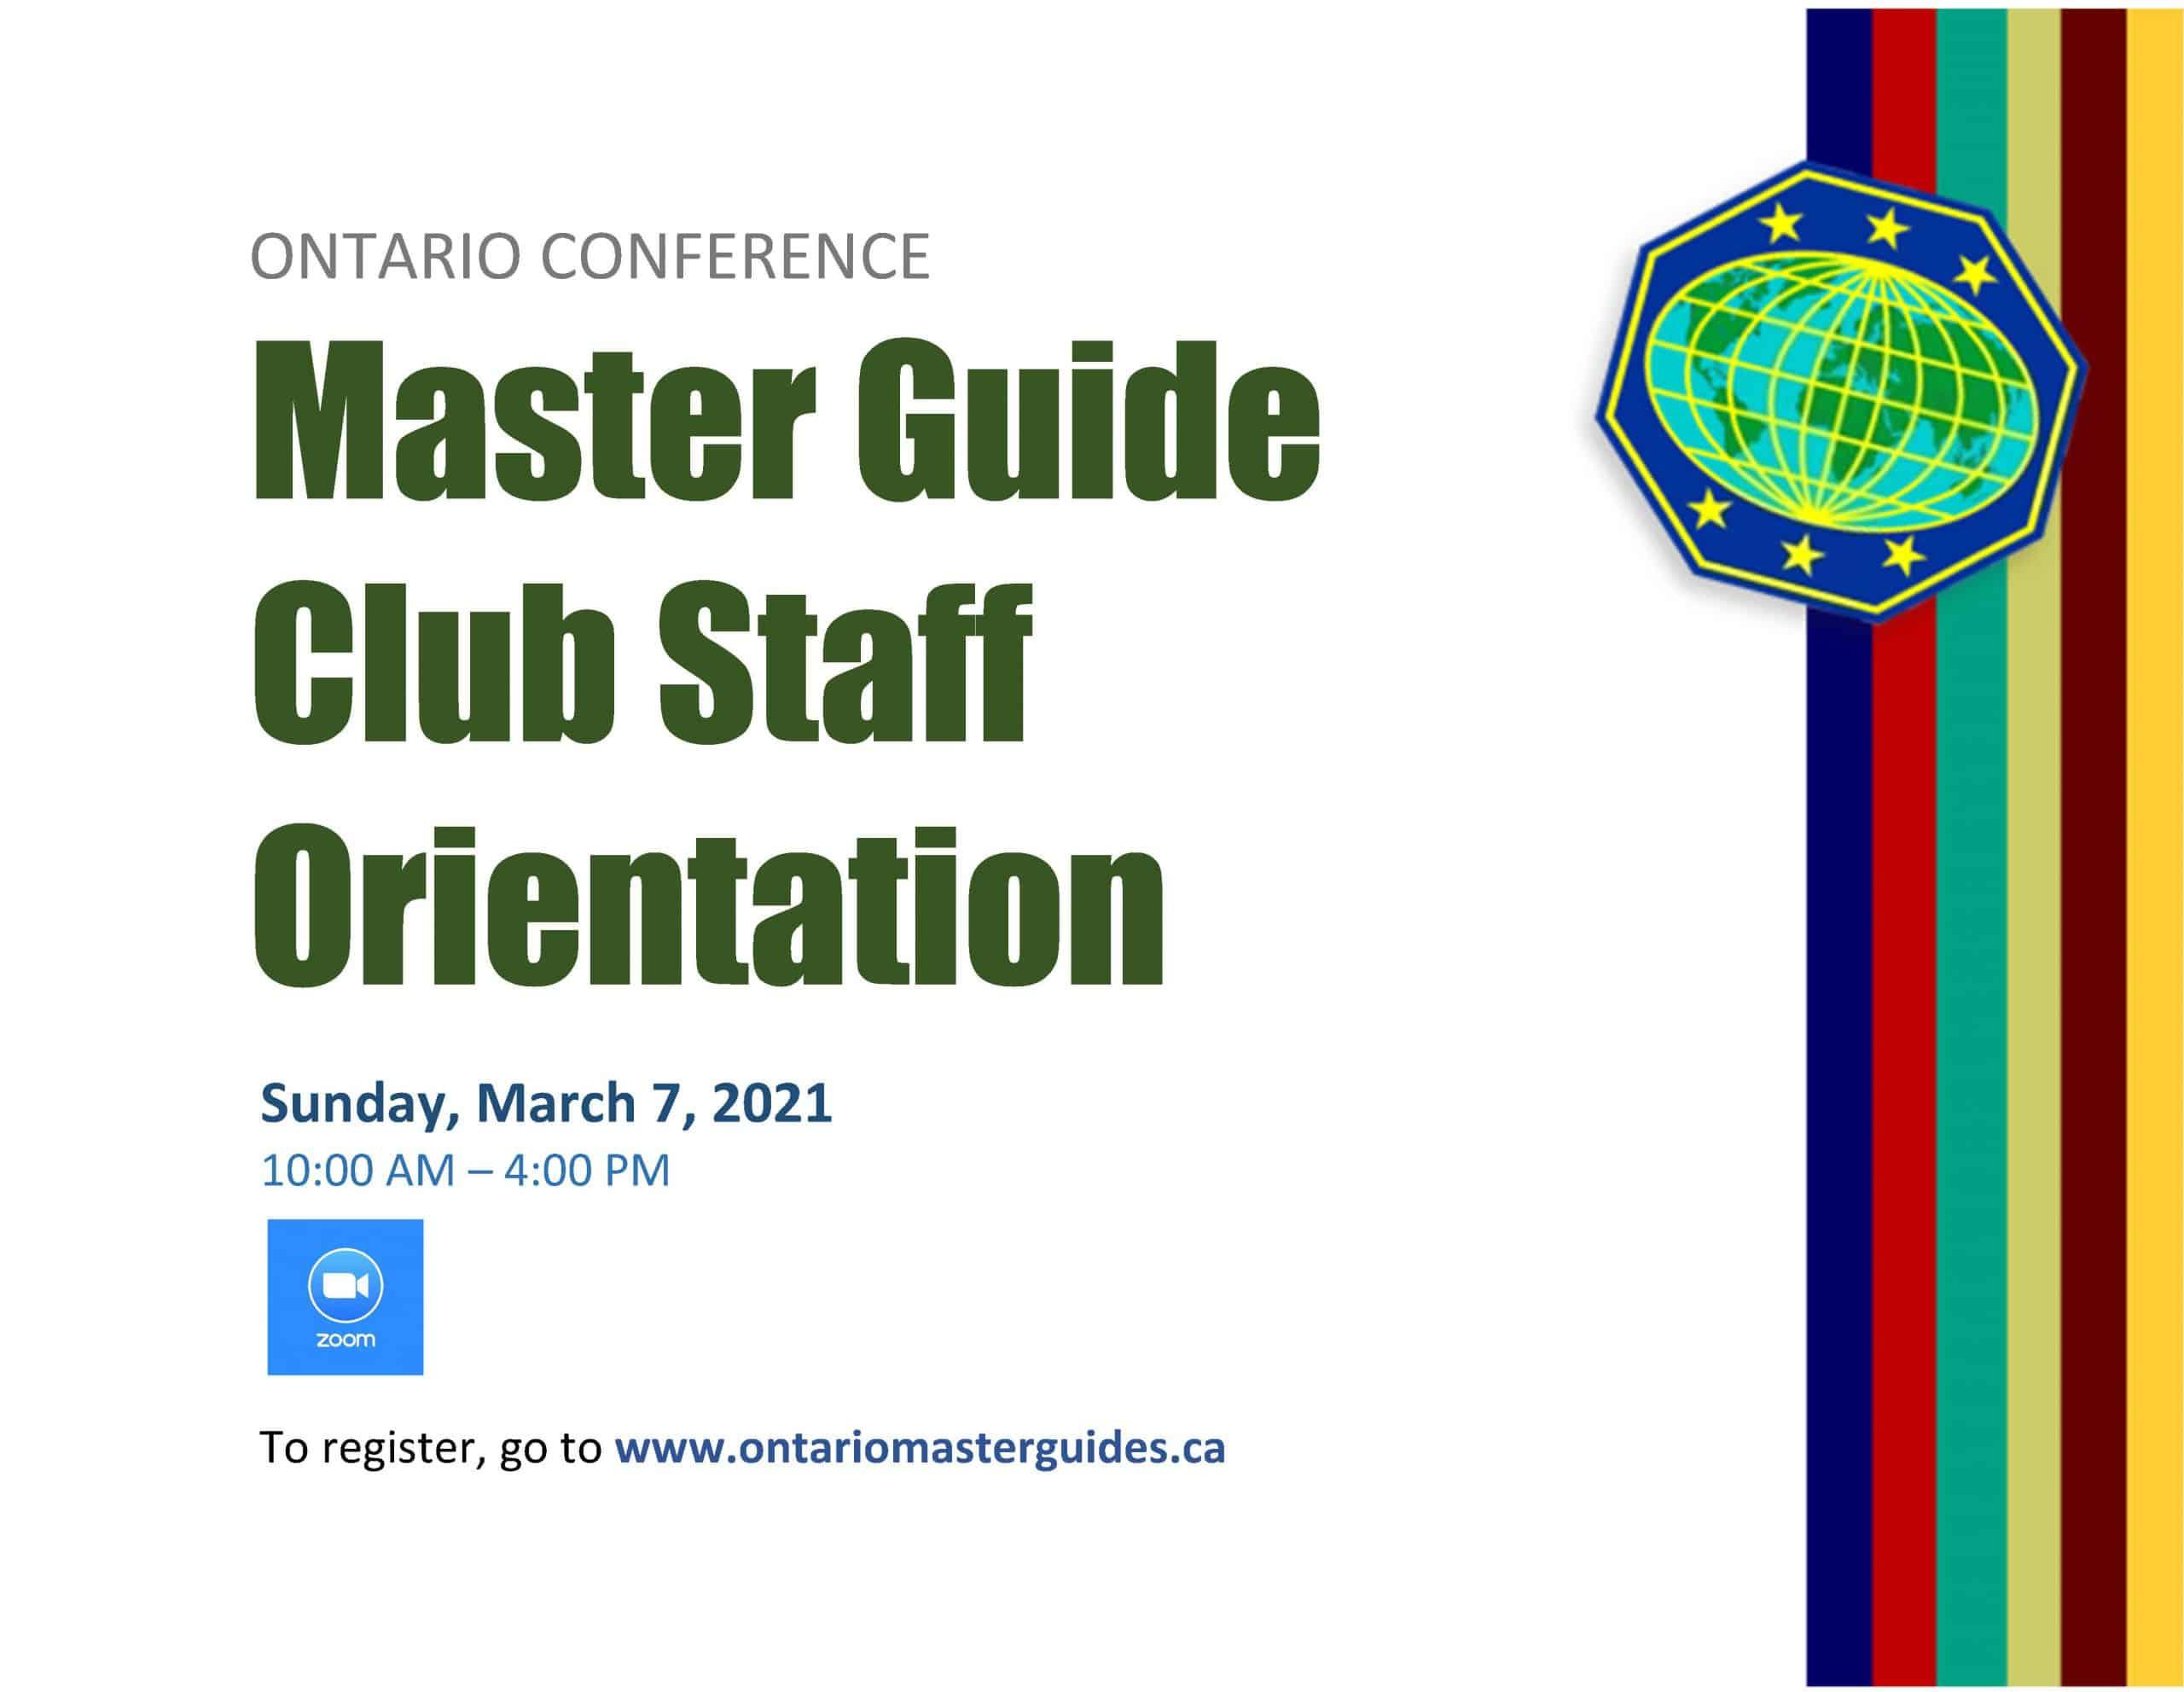 Master Guide Club Staff Orientation 2021